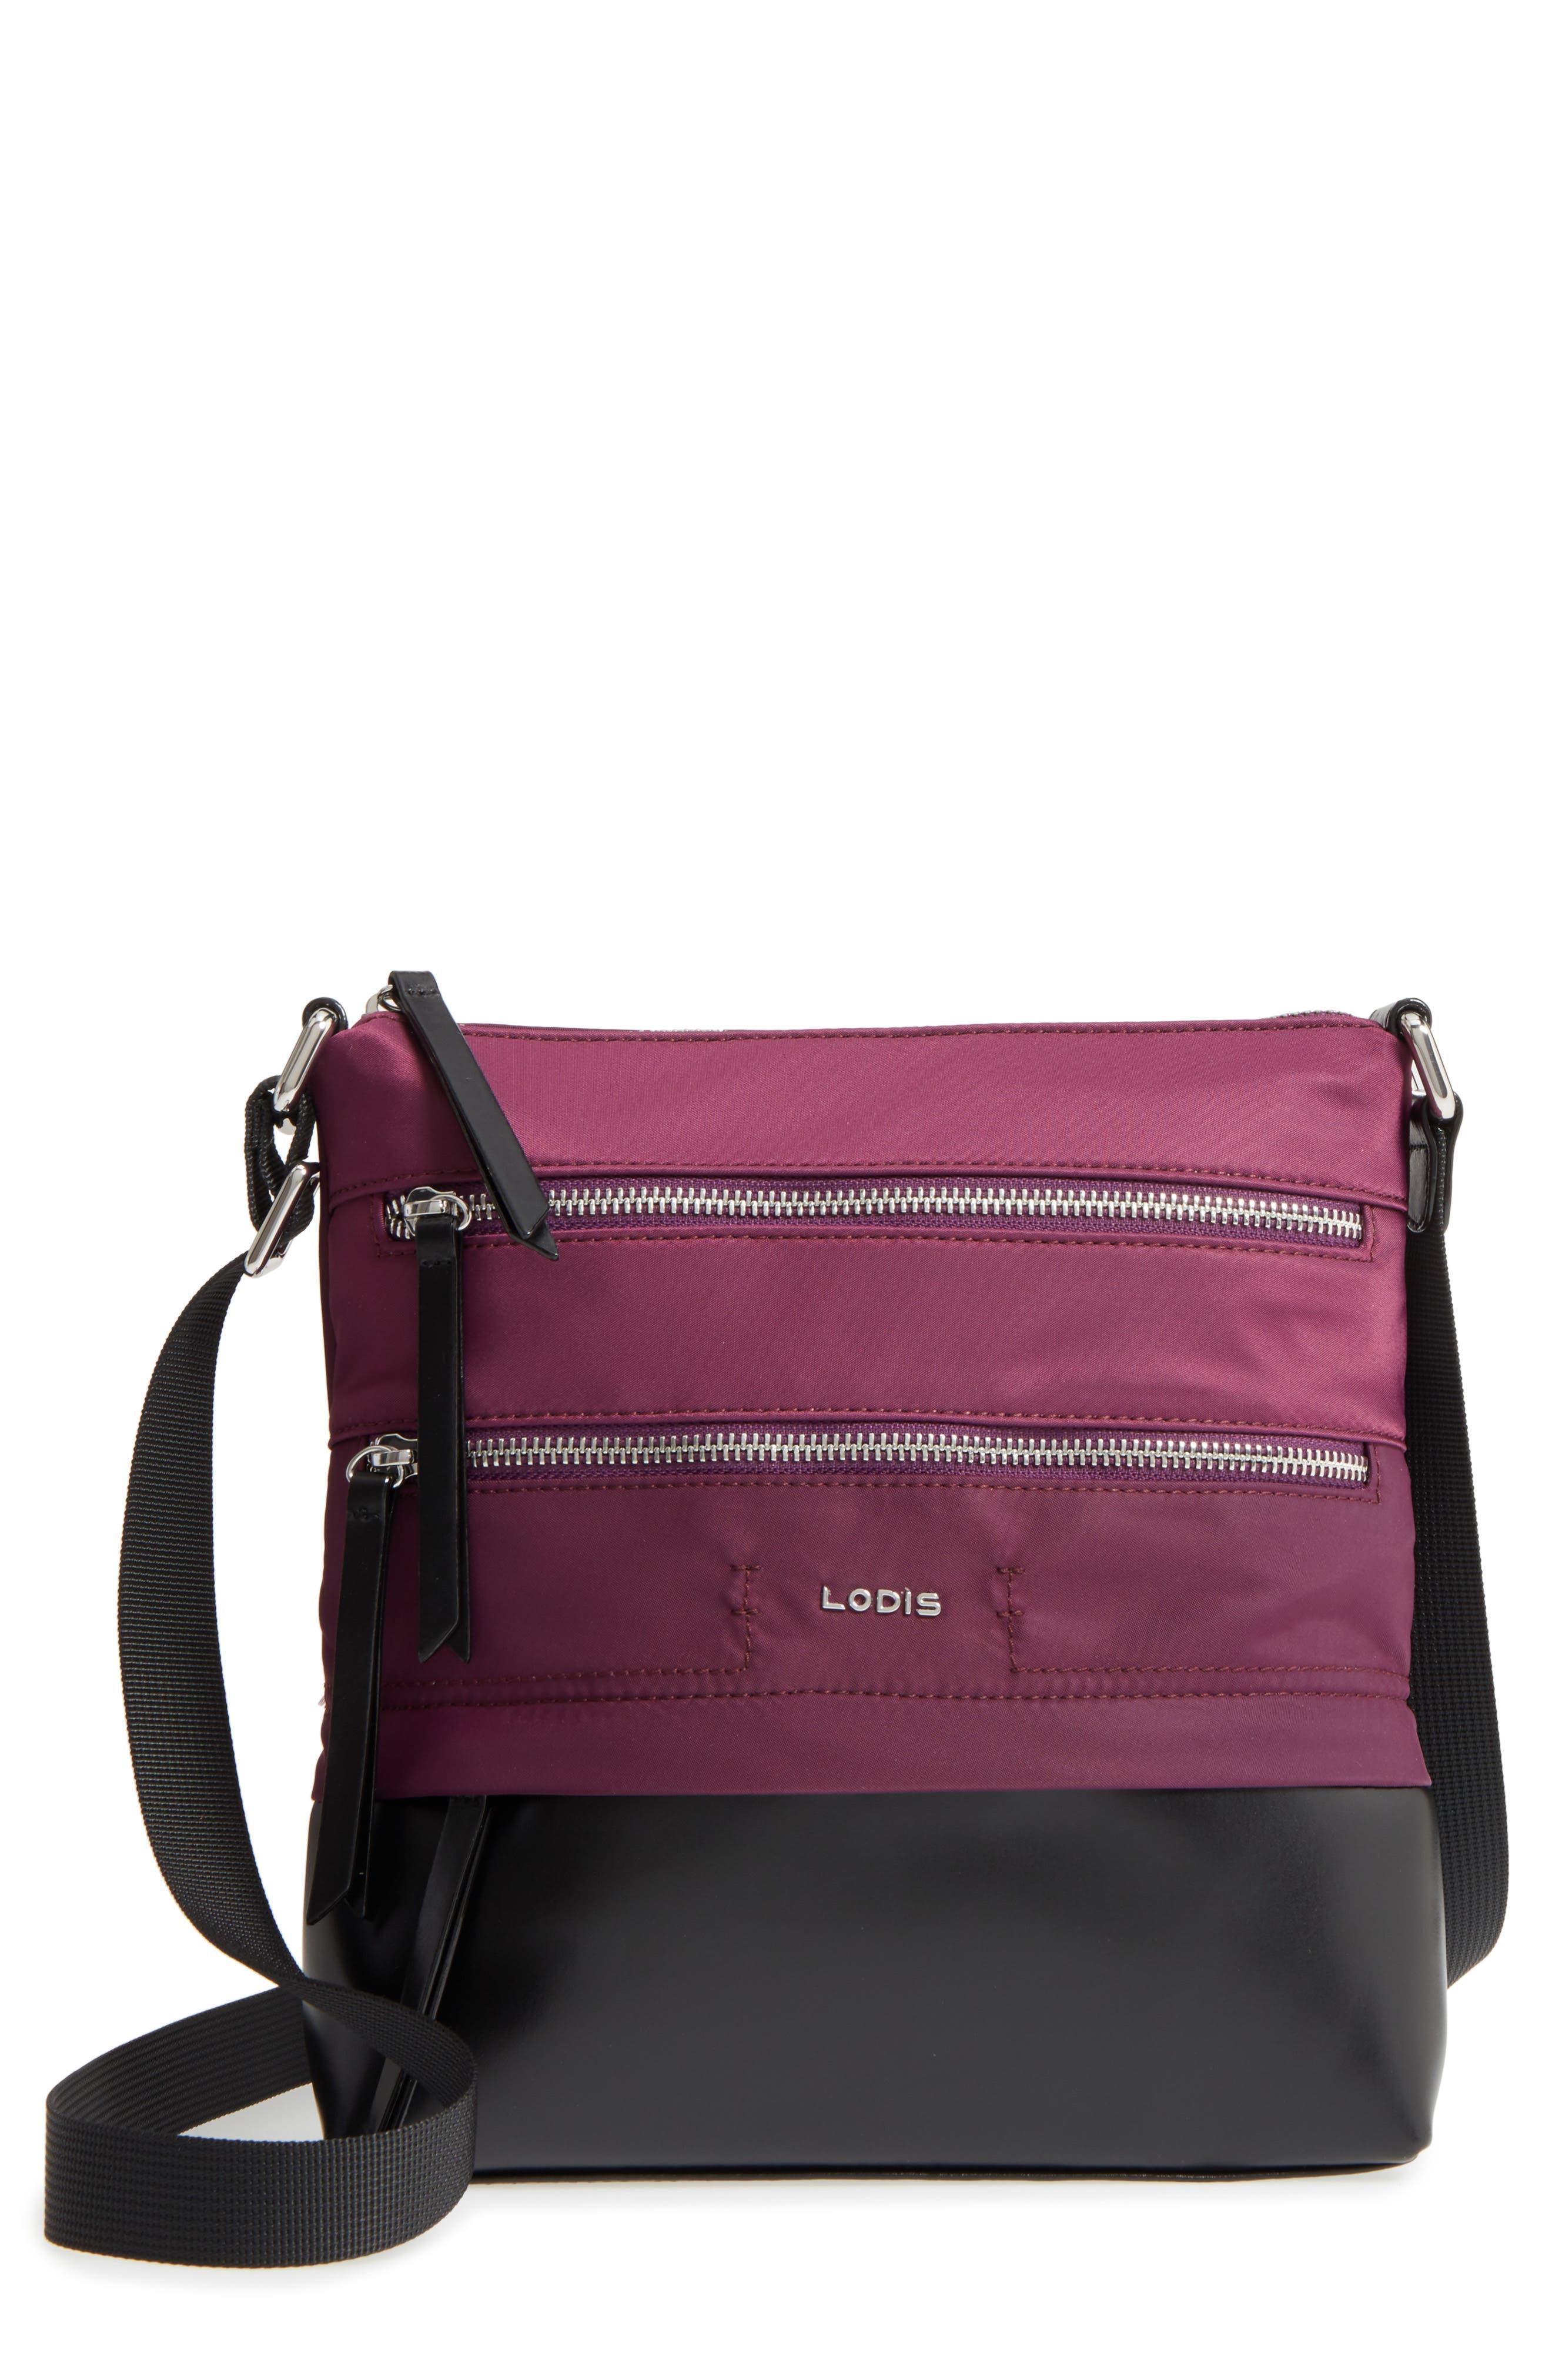 Wanda RFID Nylon & Leather Crossbody Bag,                             Main thumbnail 1, color,                             500